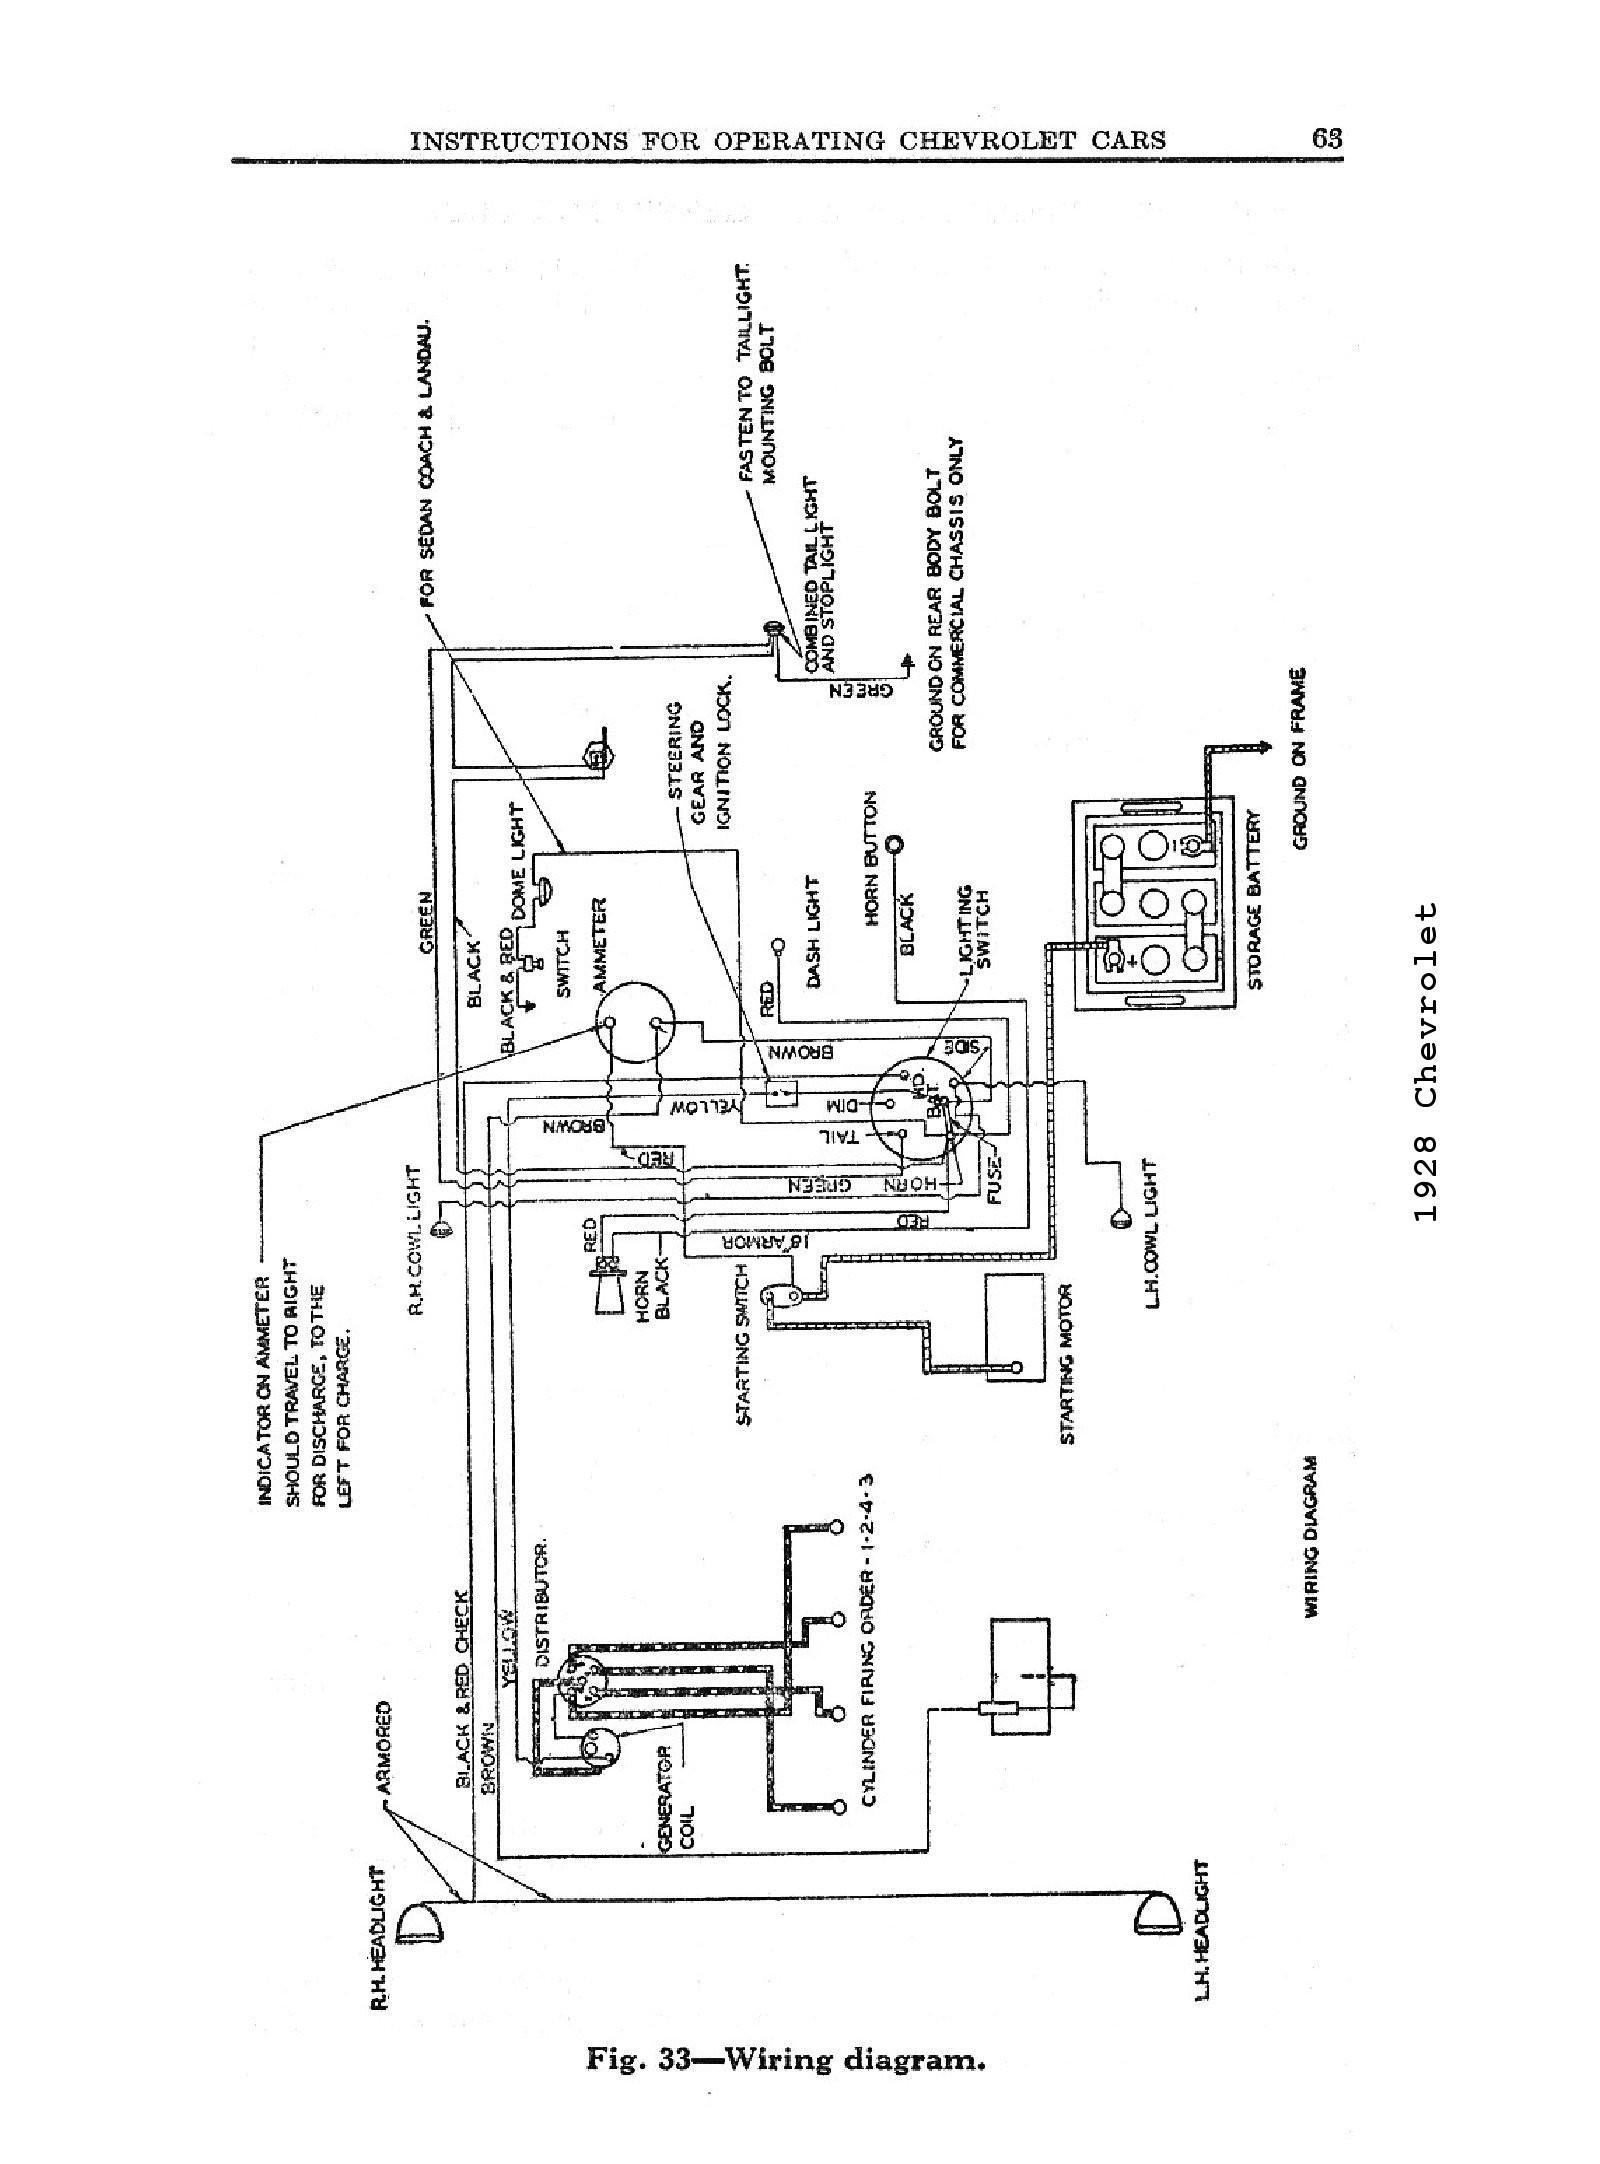 350 Engine Firing Order Diagram